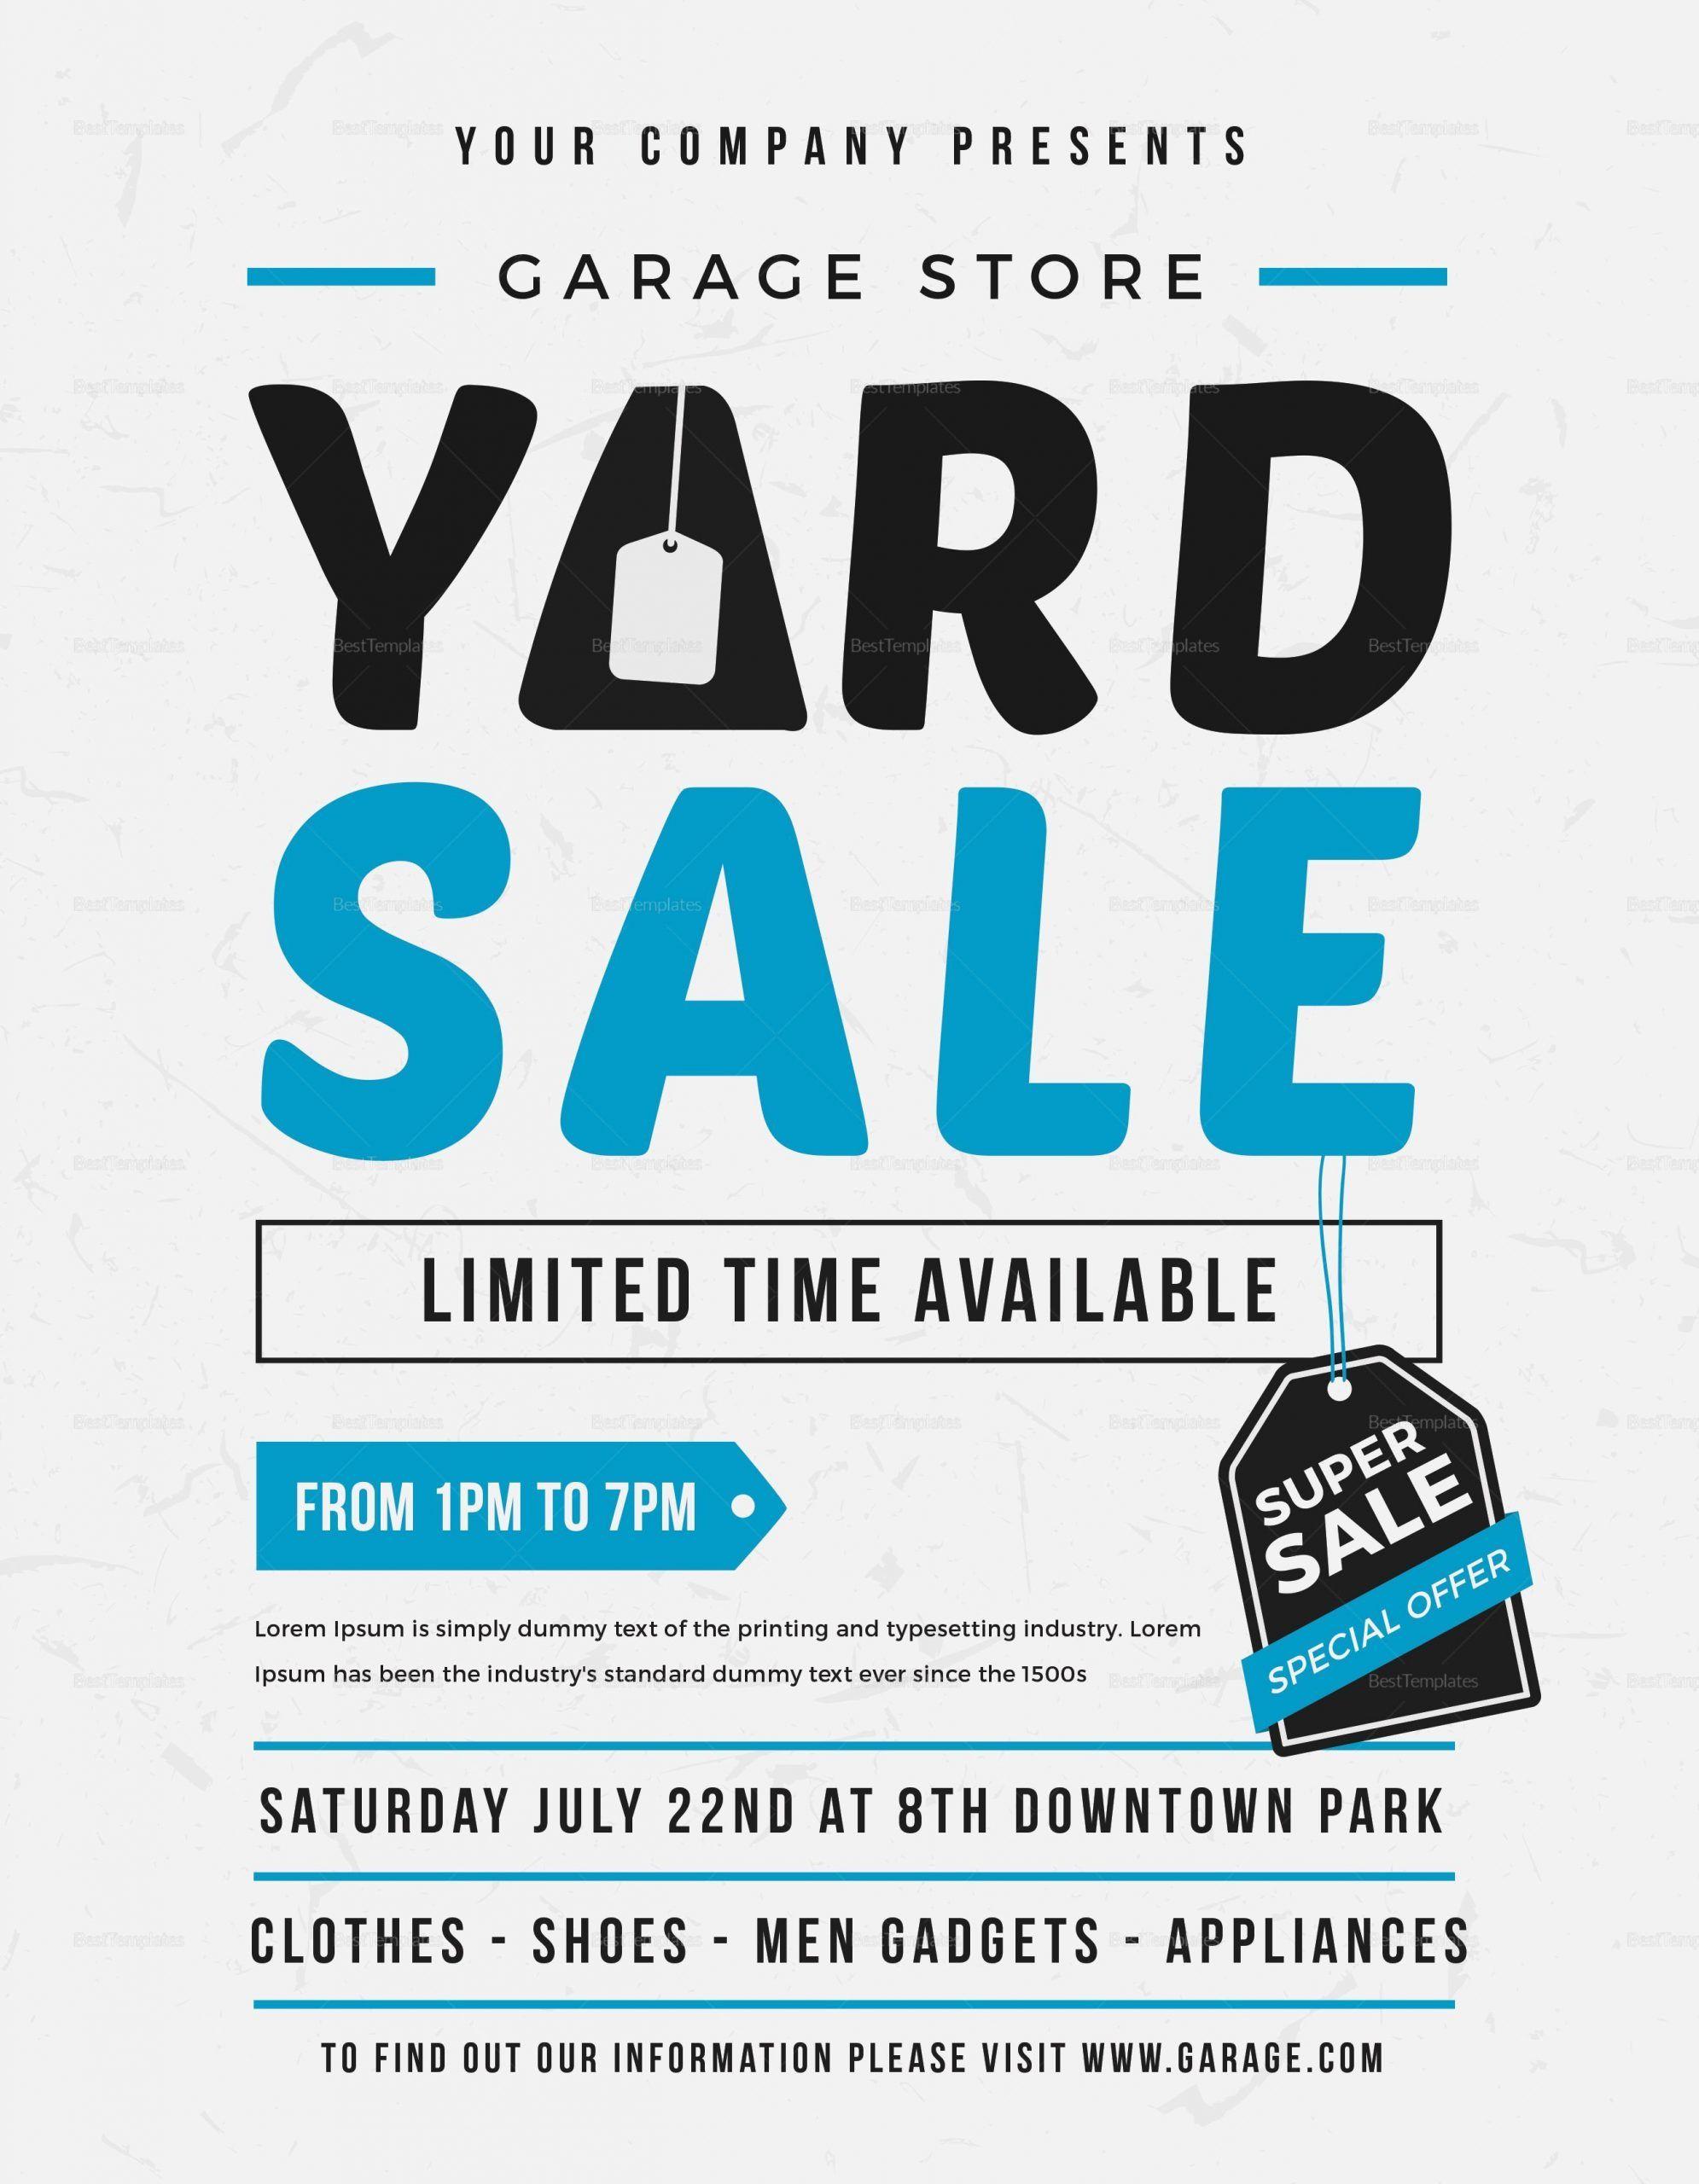 Unique Yard Sale Flyer Template Regarding Yard Sale Flyer Template Word Flyer S Flyer Template Sale Flyer Business Template Yard sale flyer template free